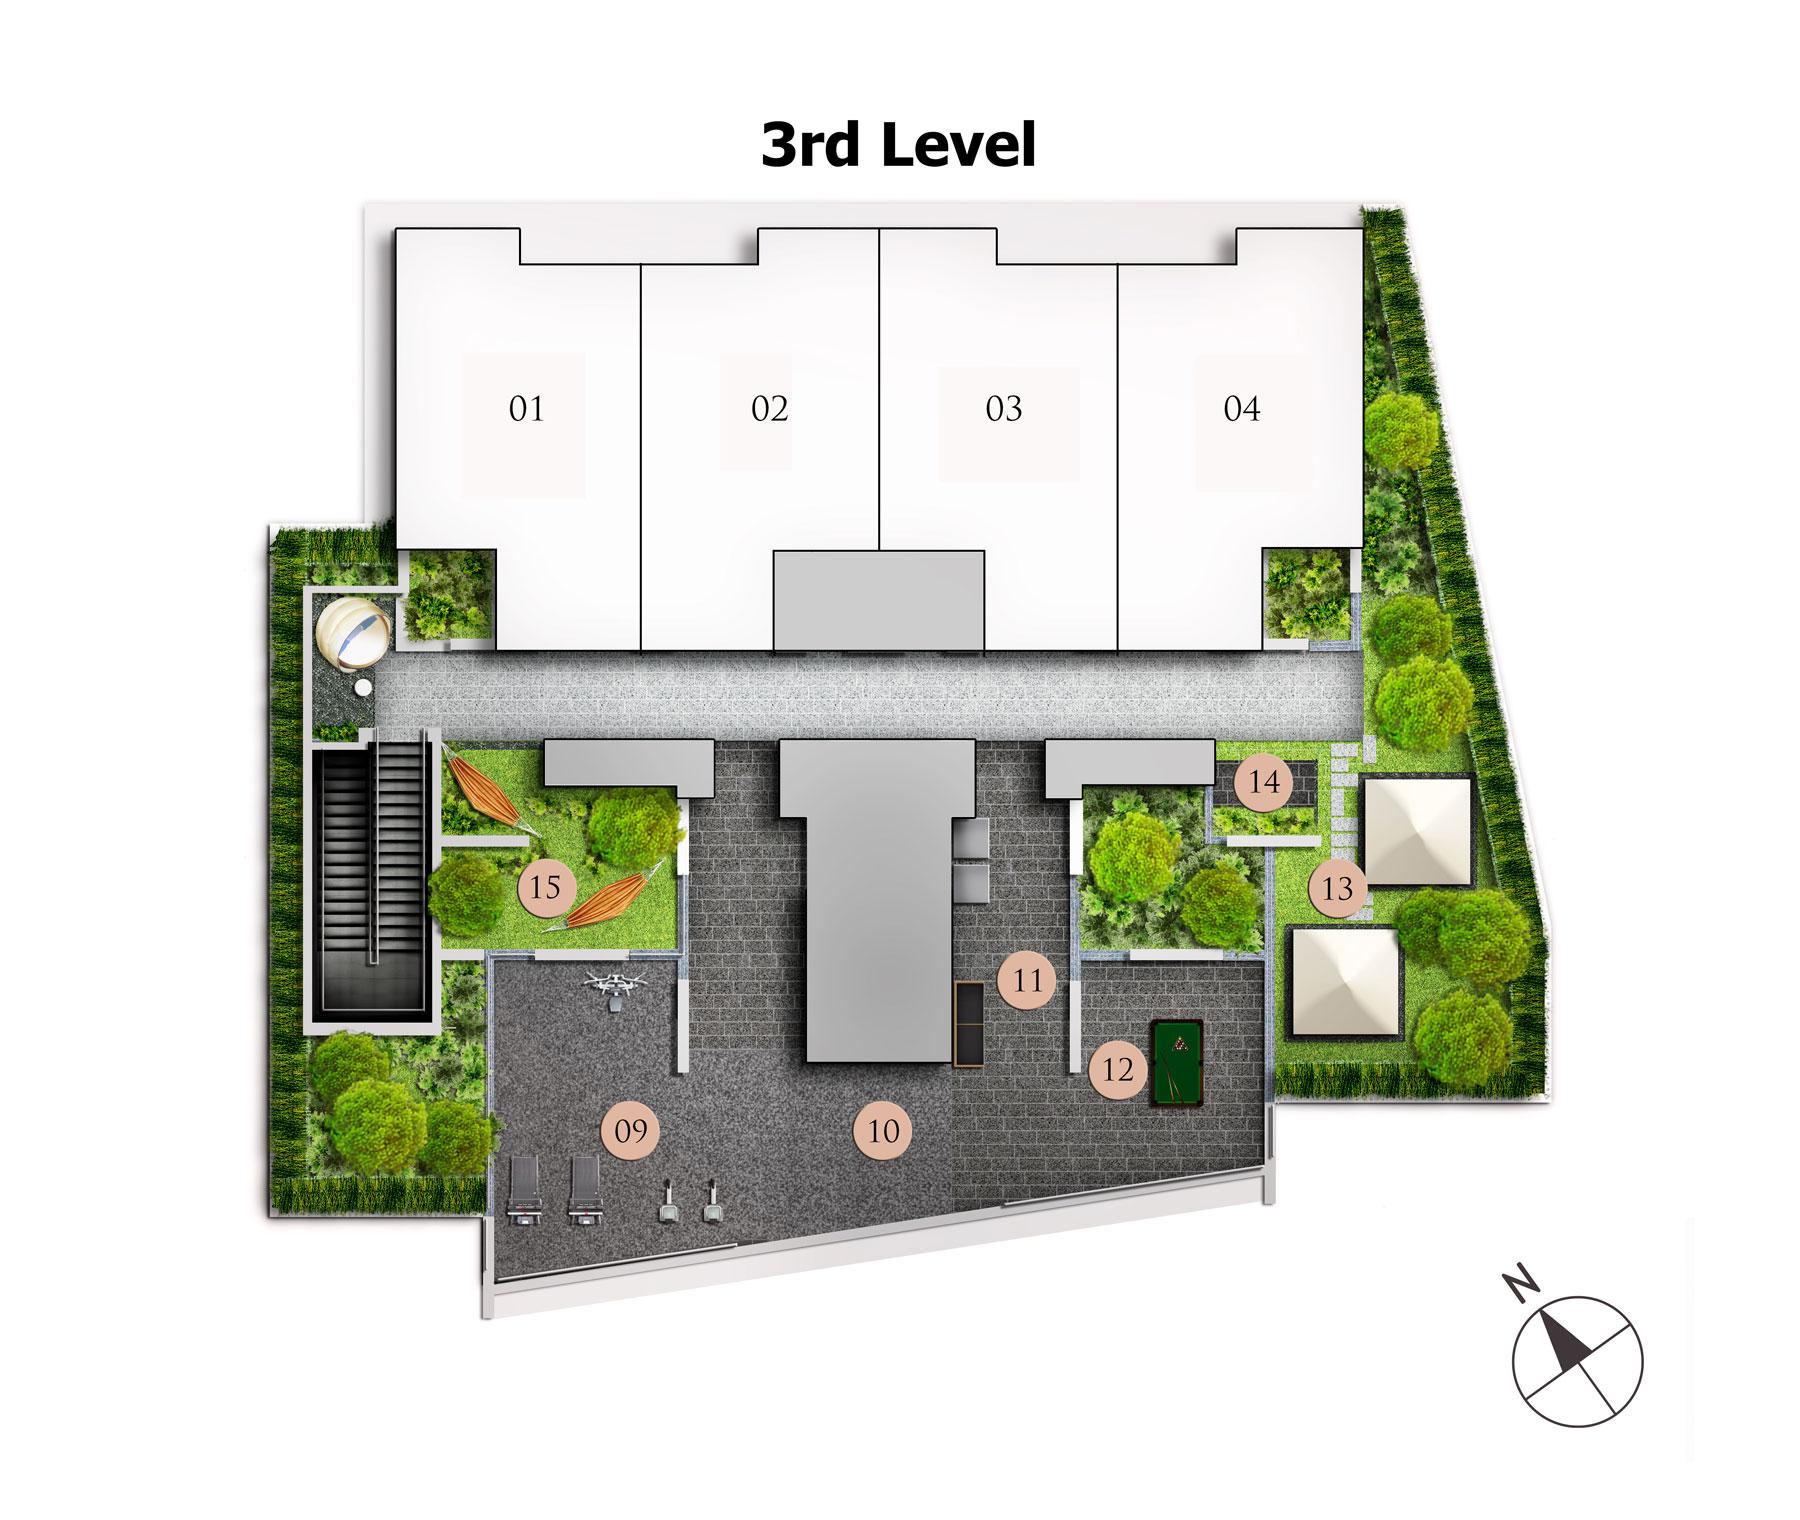 Site Plan Level 3